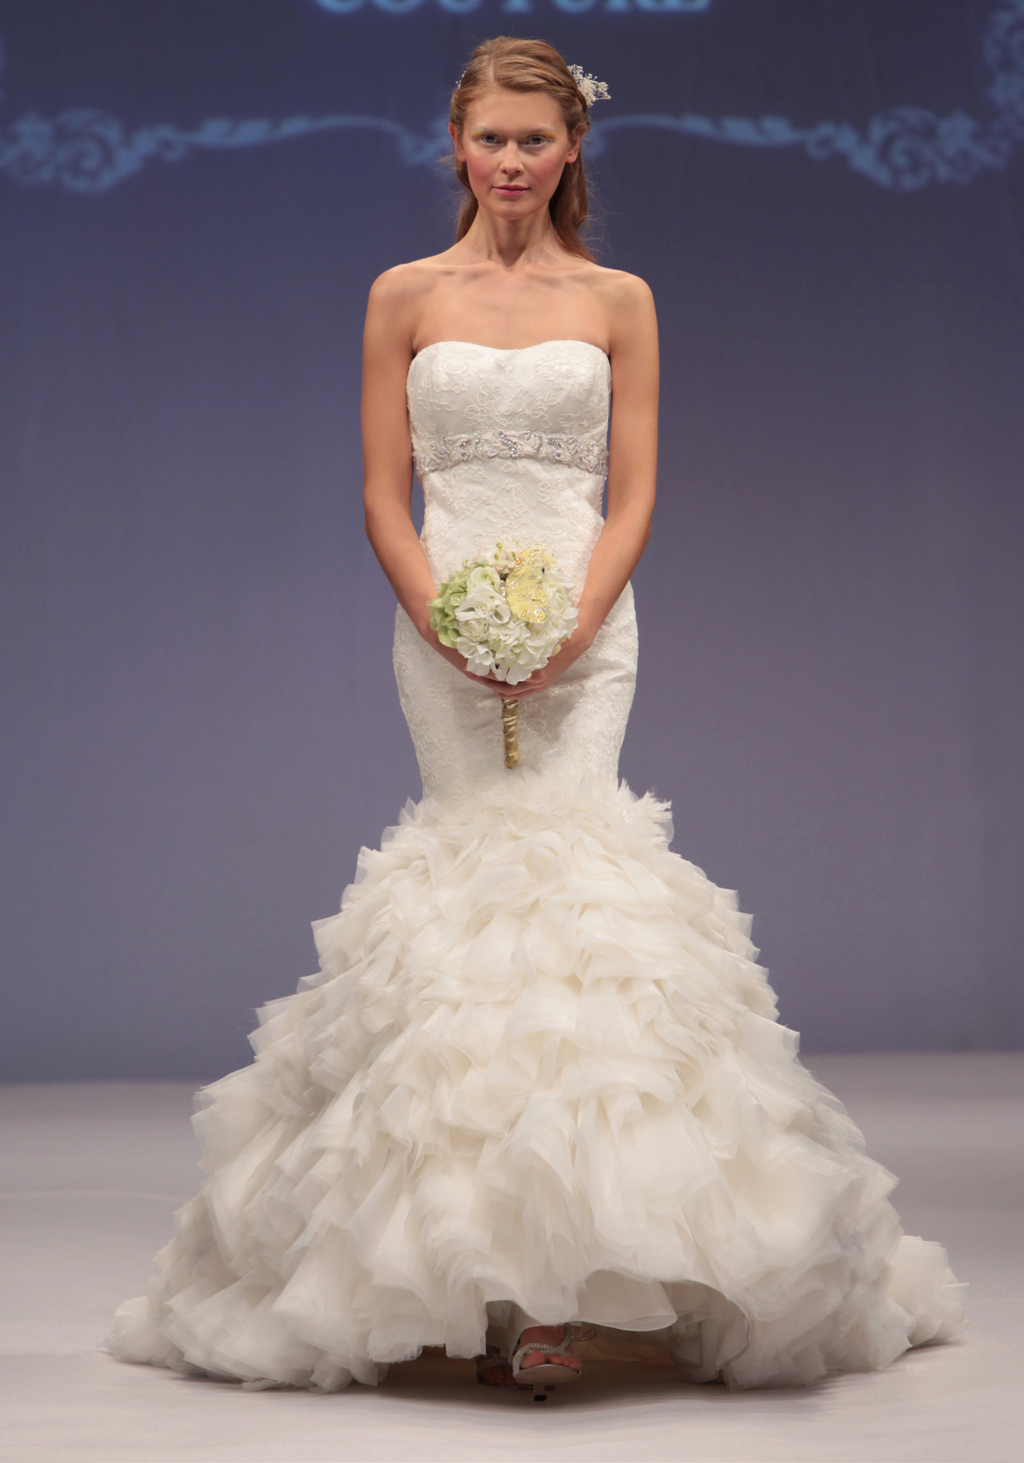 Winnie-couture-bridal-gown-spring-2013-wedding-dress-daveney.full